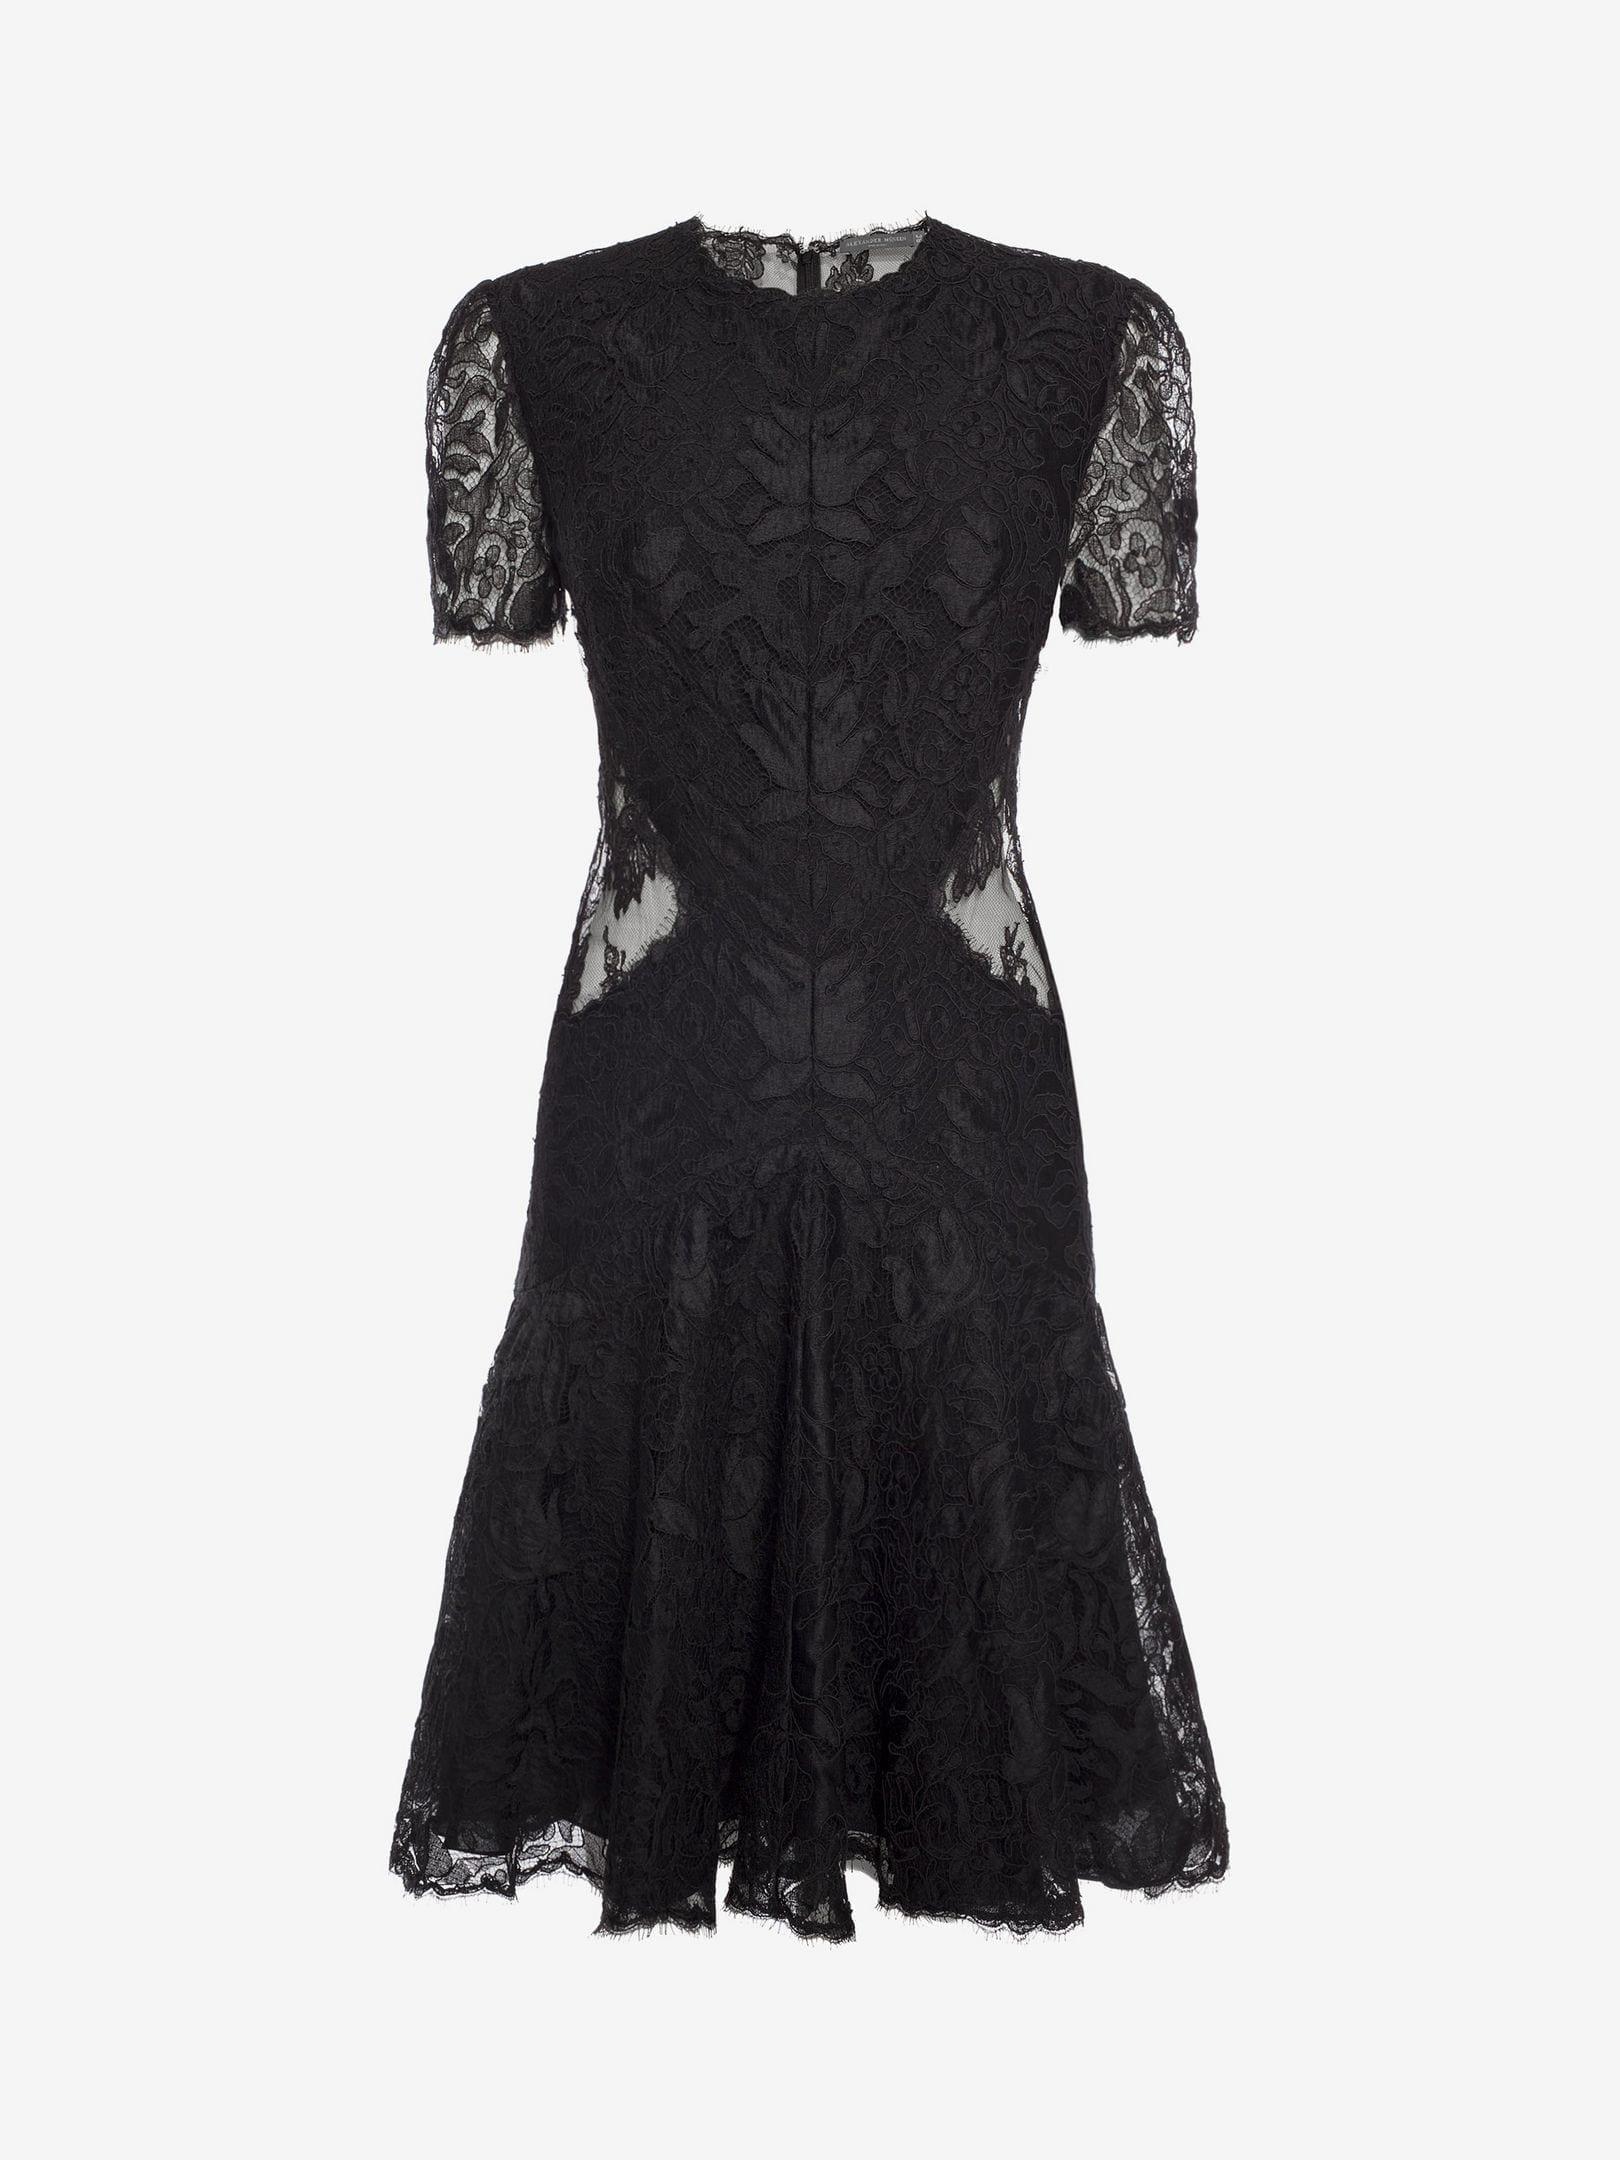 ALEXANDER MCQUEEN Lace Mini Black Dress